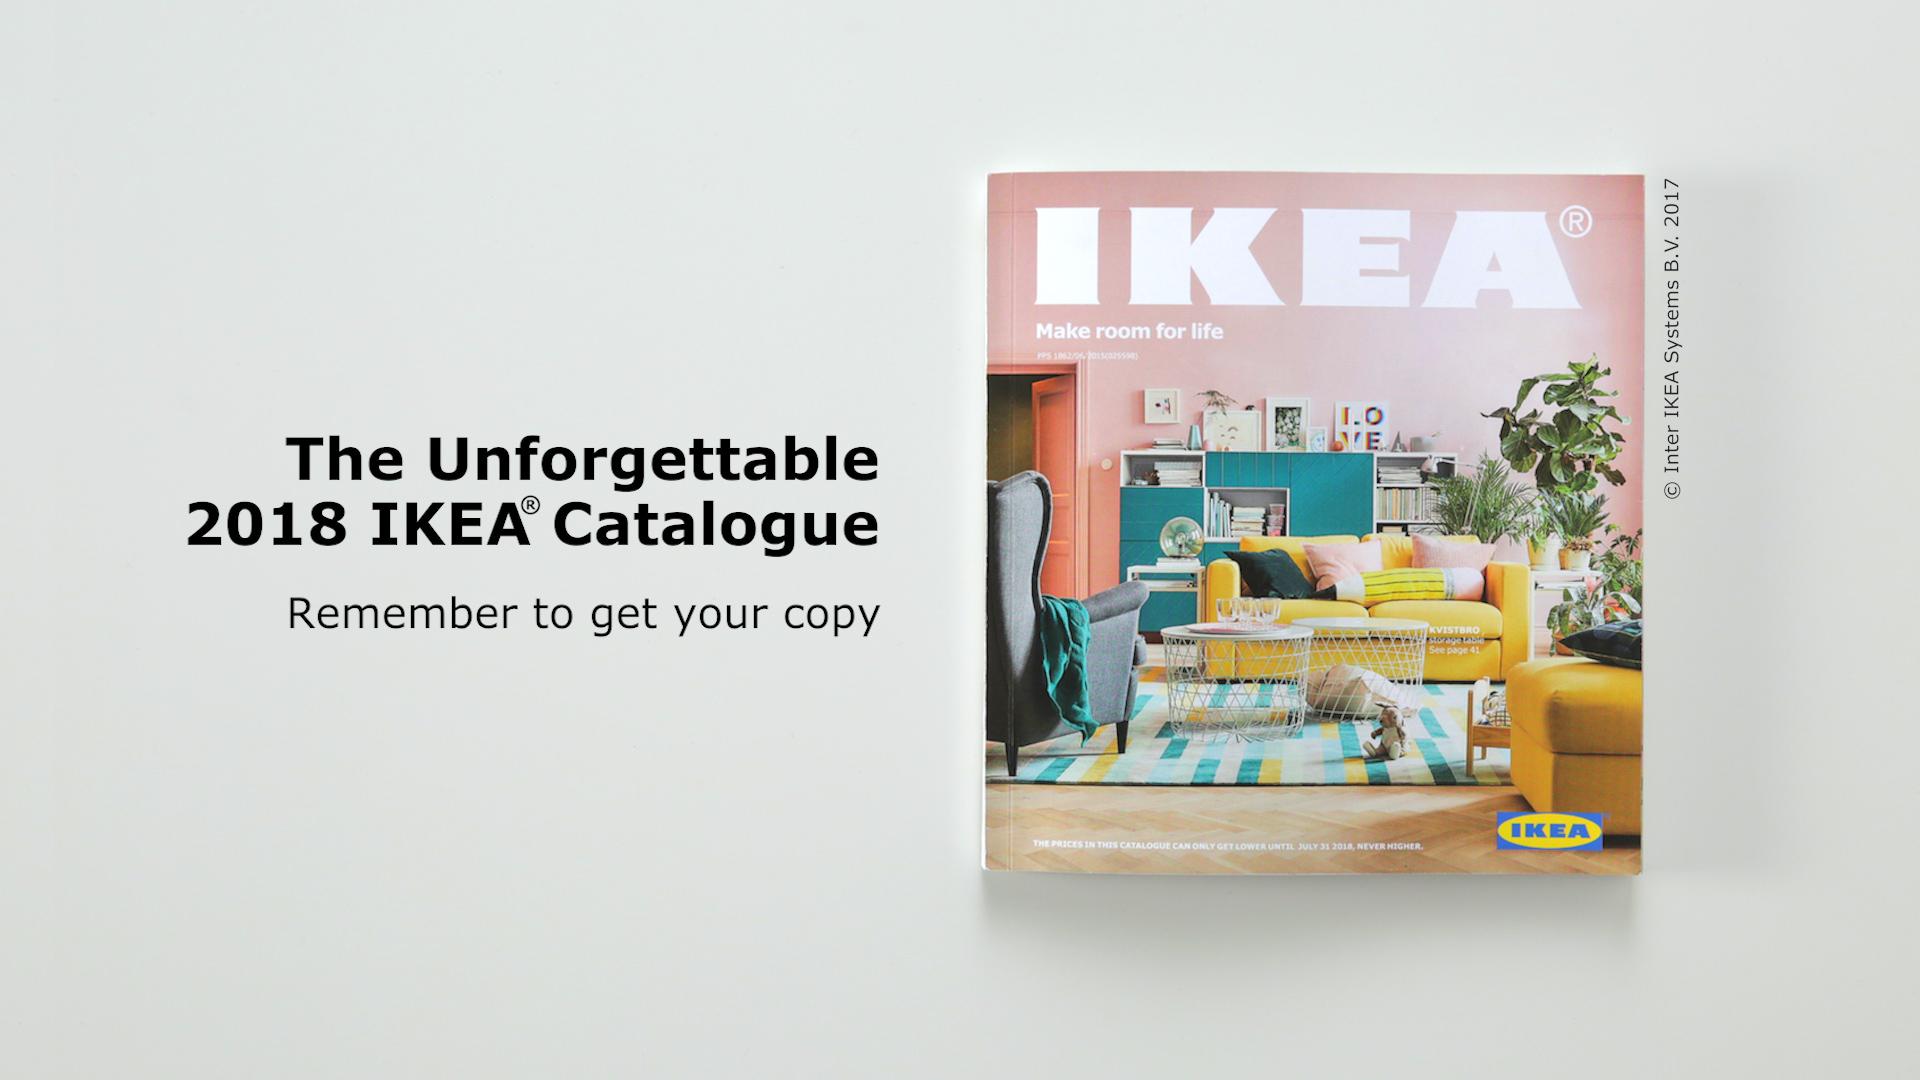 Human catalogue 2018 ikea for Catalogue ikea 2018